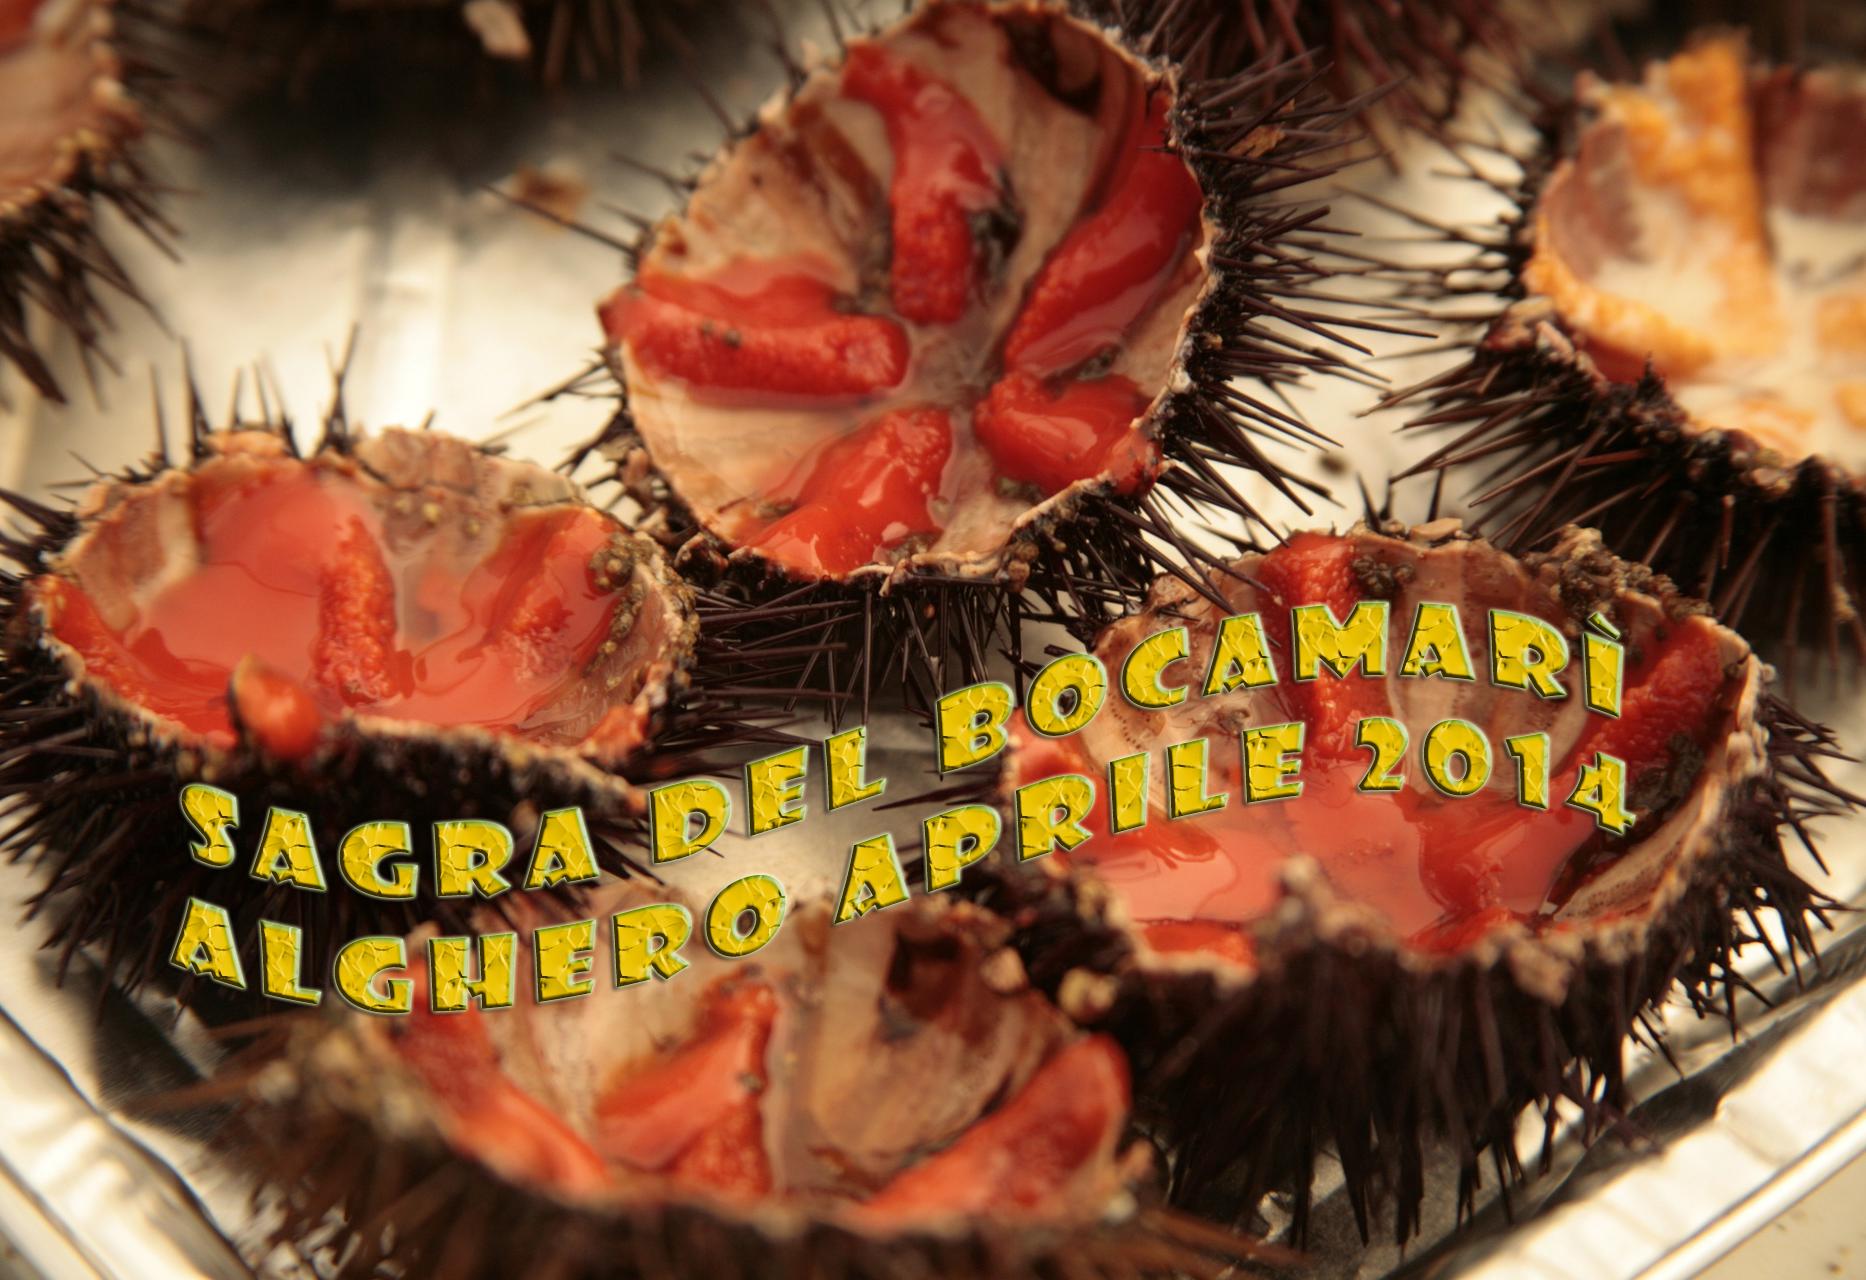 Sagra del Bogamari Alghero 2014